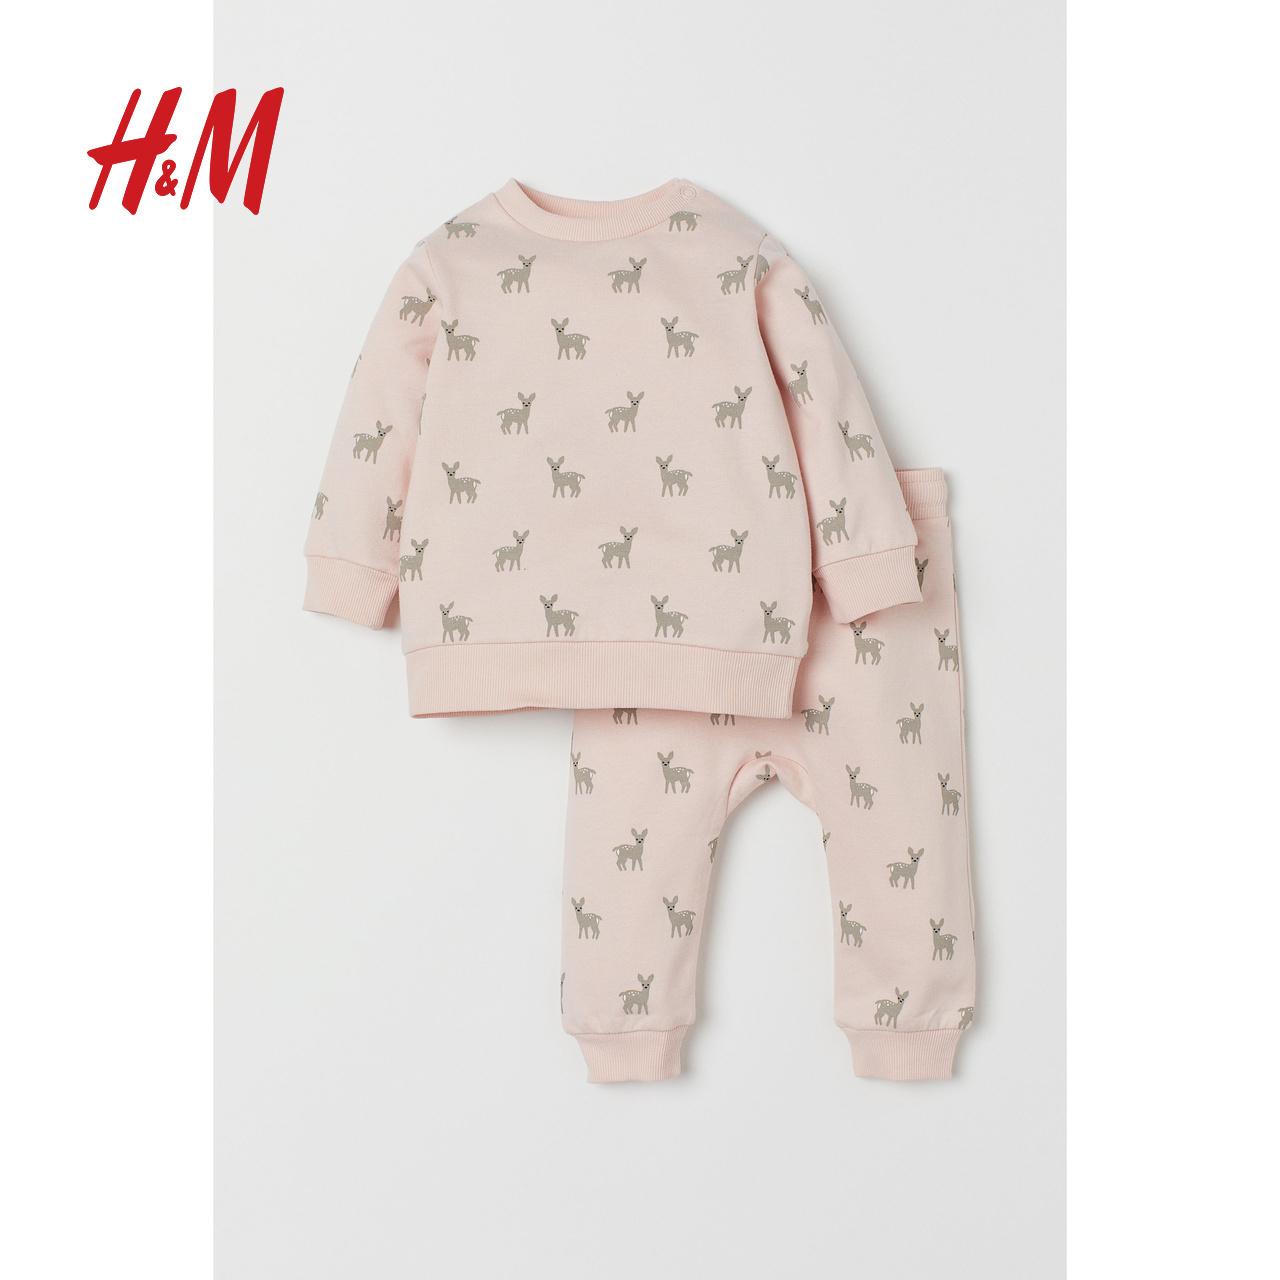 HM 童装婴儿宝宝秋冬套装2019新款卫衣长裤洋气时髦两件套0593434